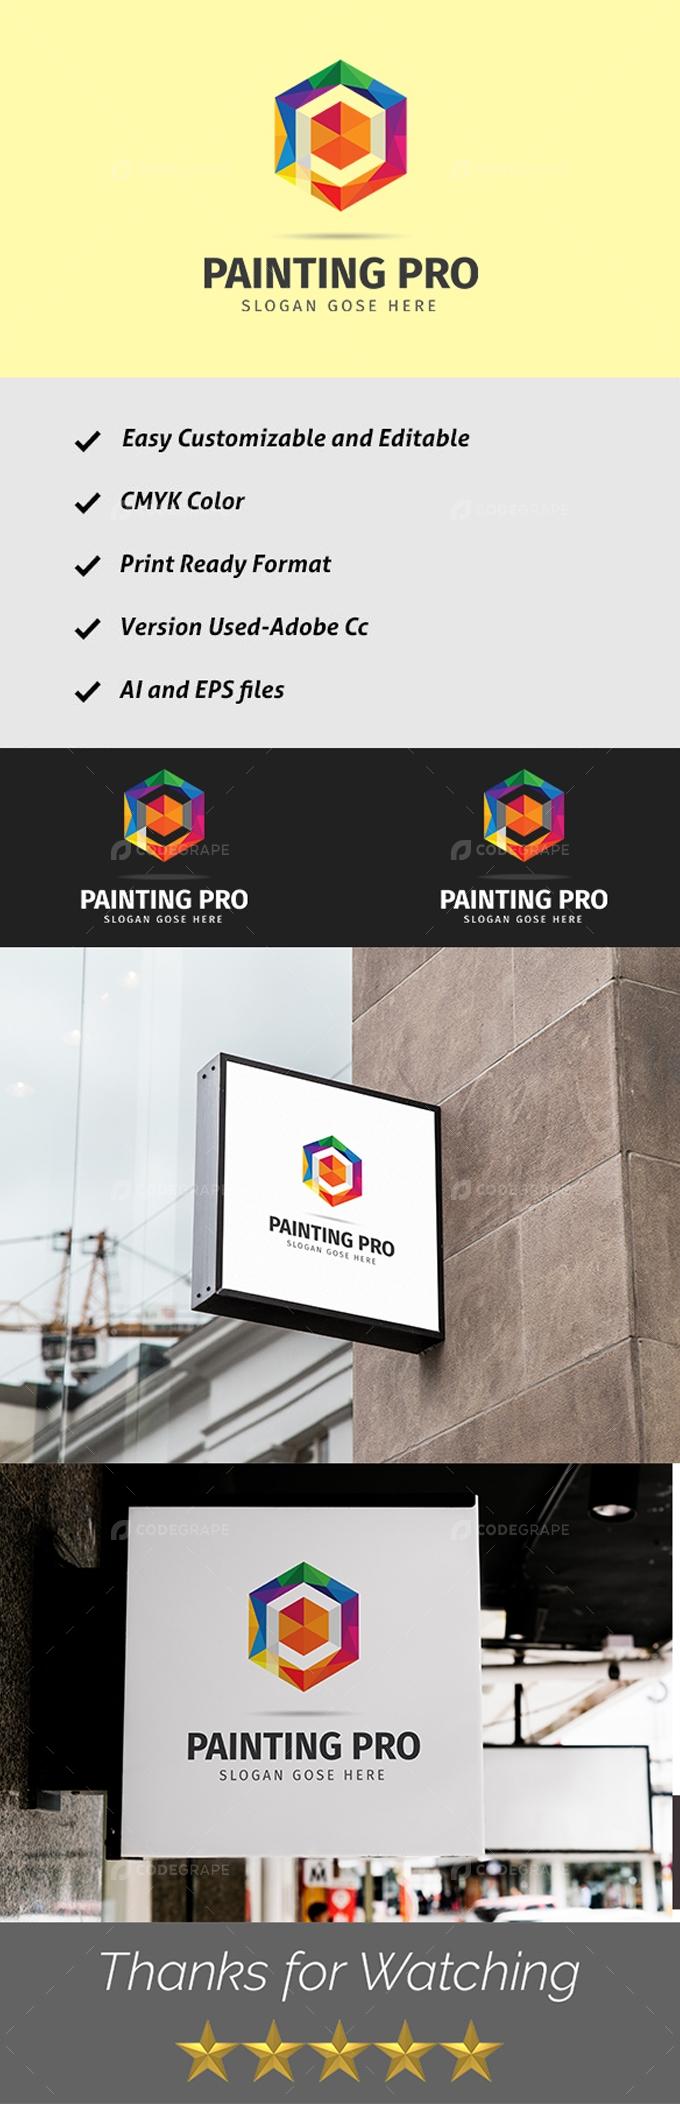 Painting Pro P Logo